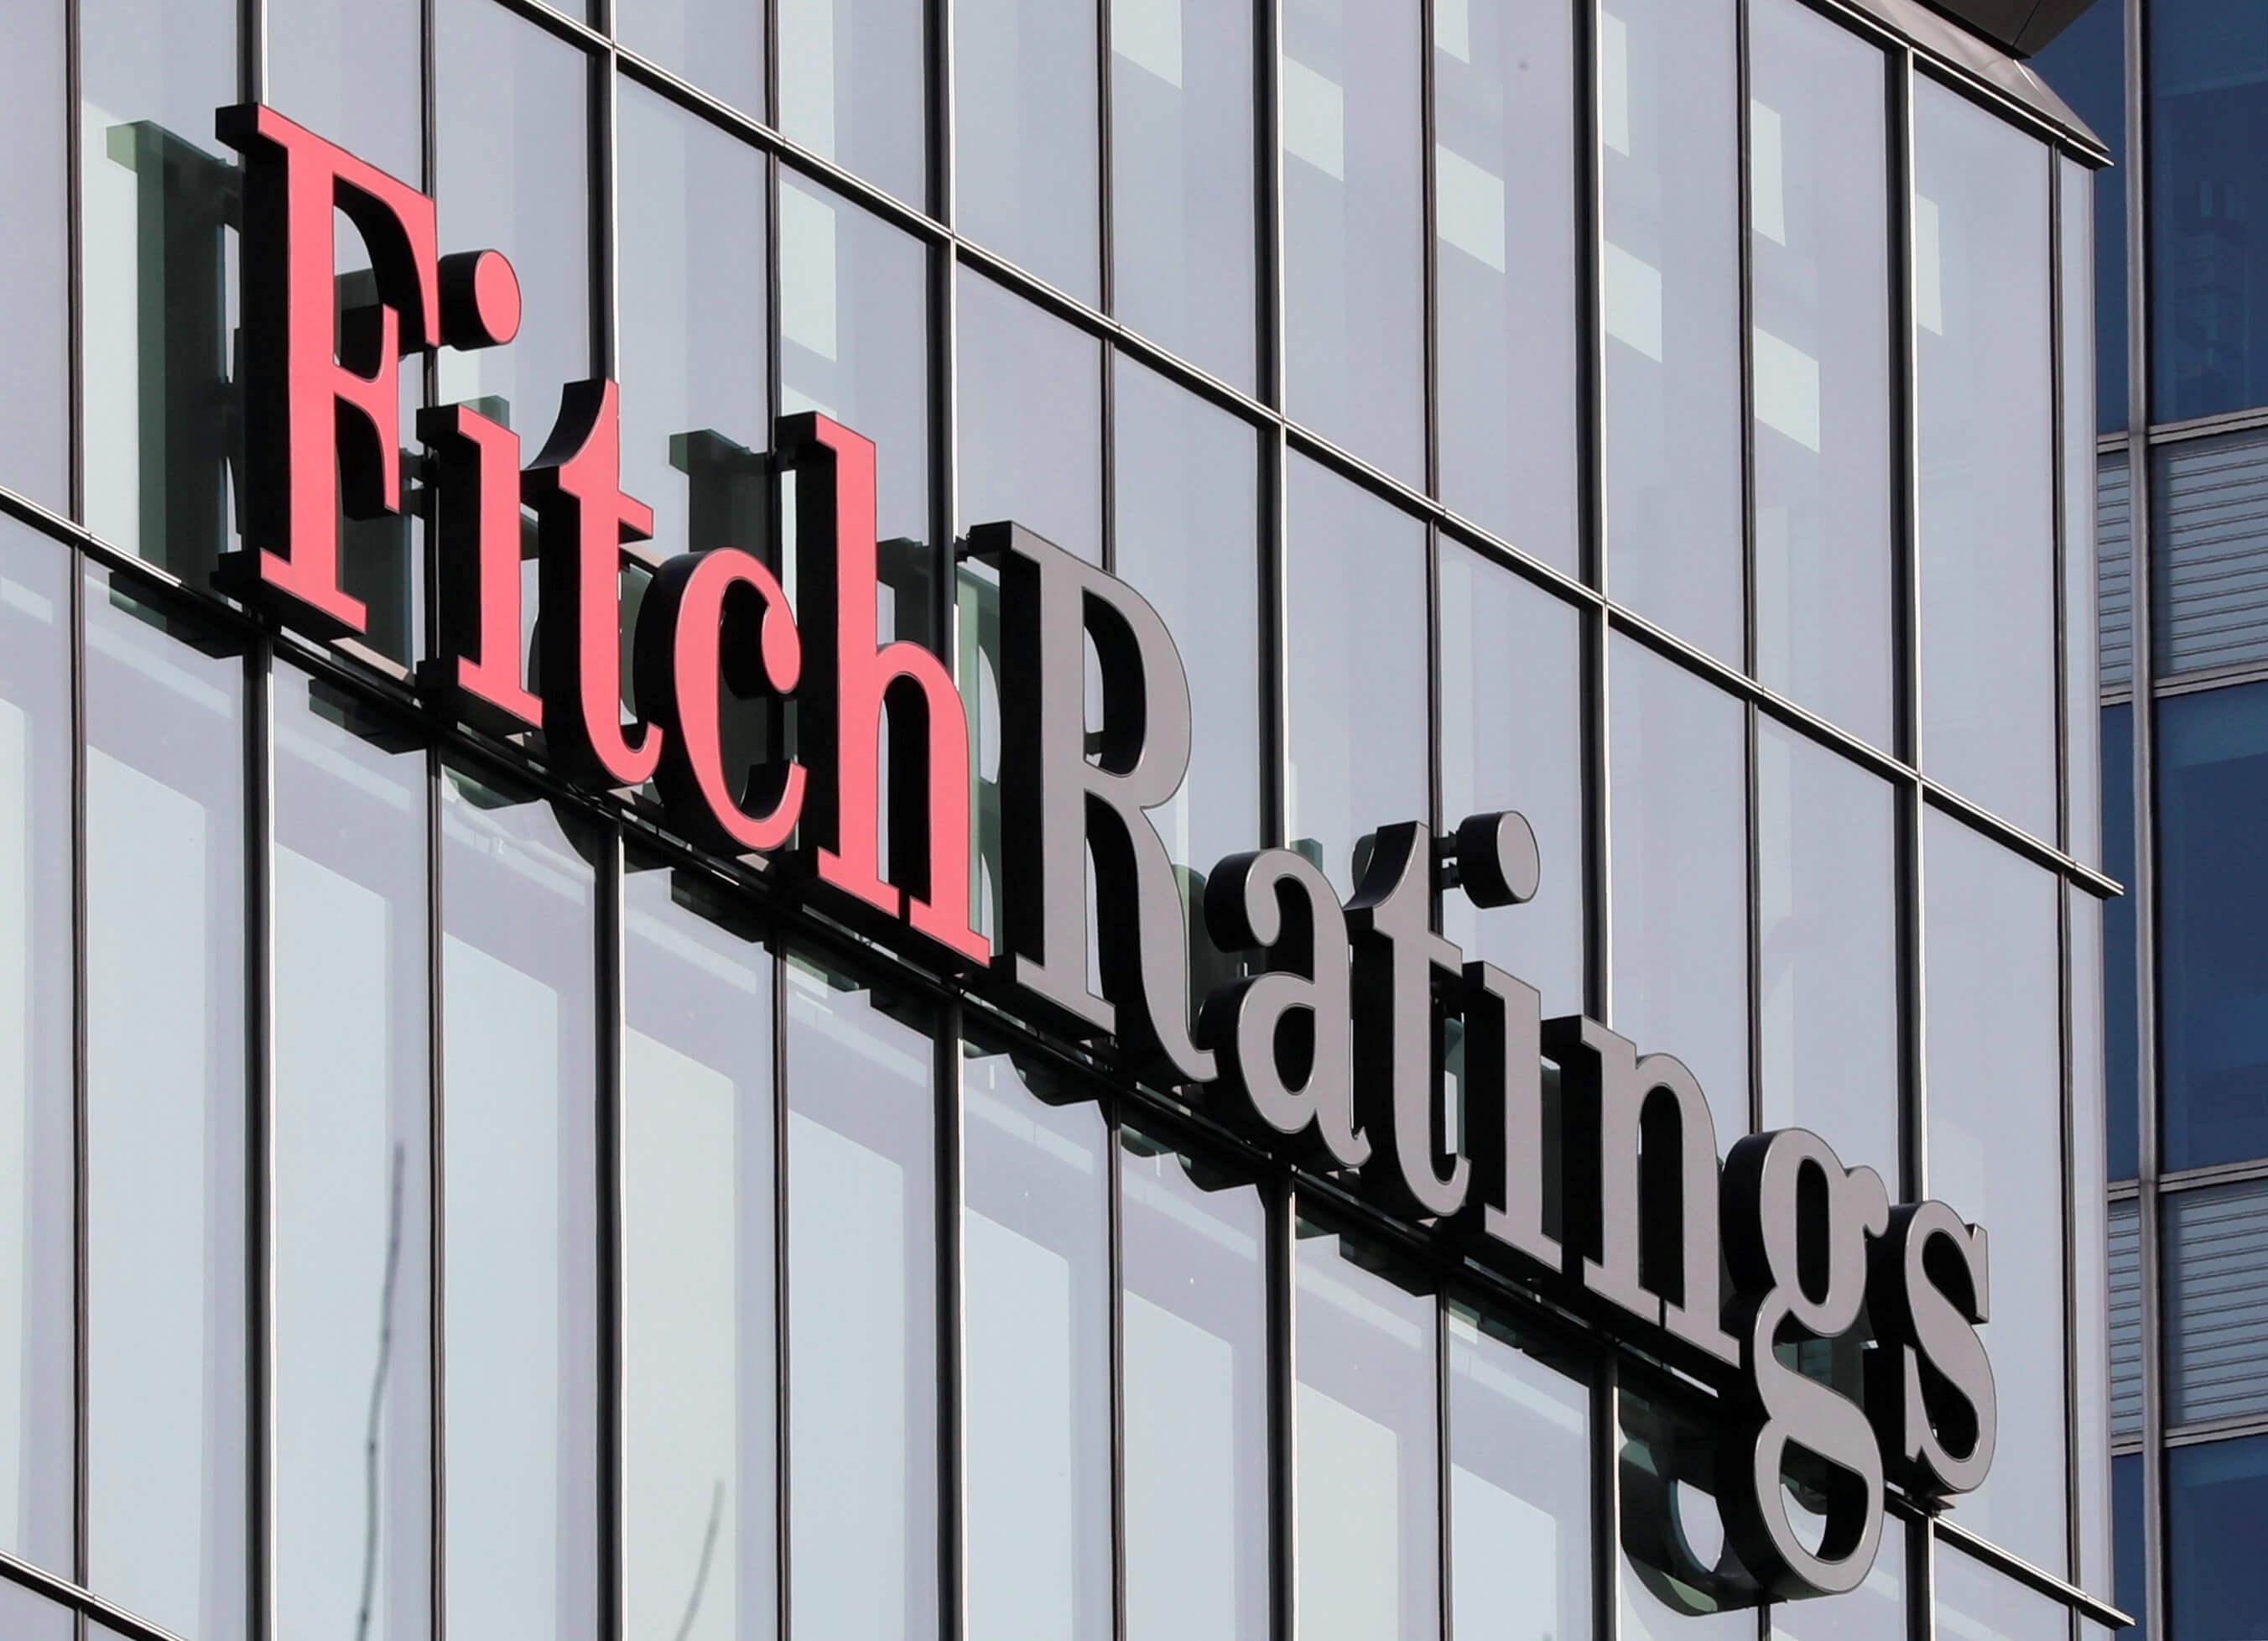 Fitch: Σήμερα η ετυμηγορία για την οικονομία -Πιθανή έξοδος στις αγορές την άλλη εβδομάδα